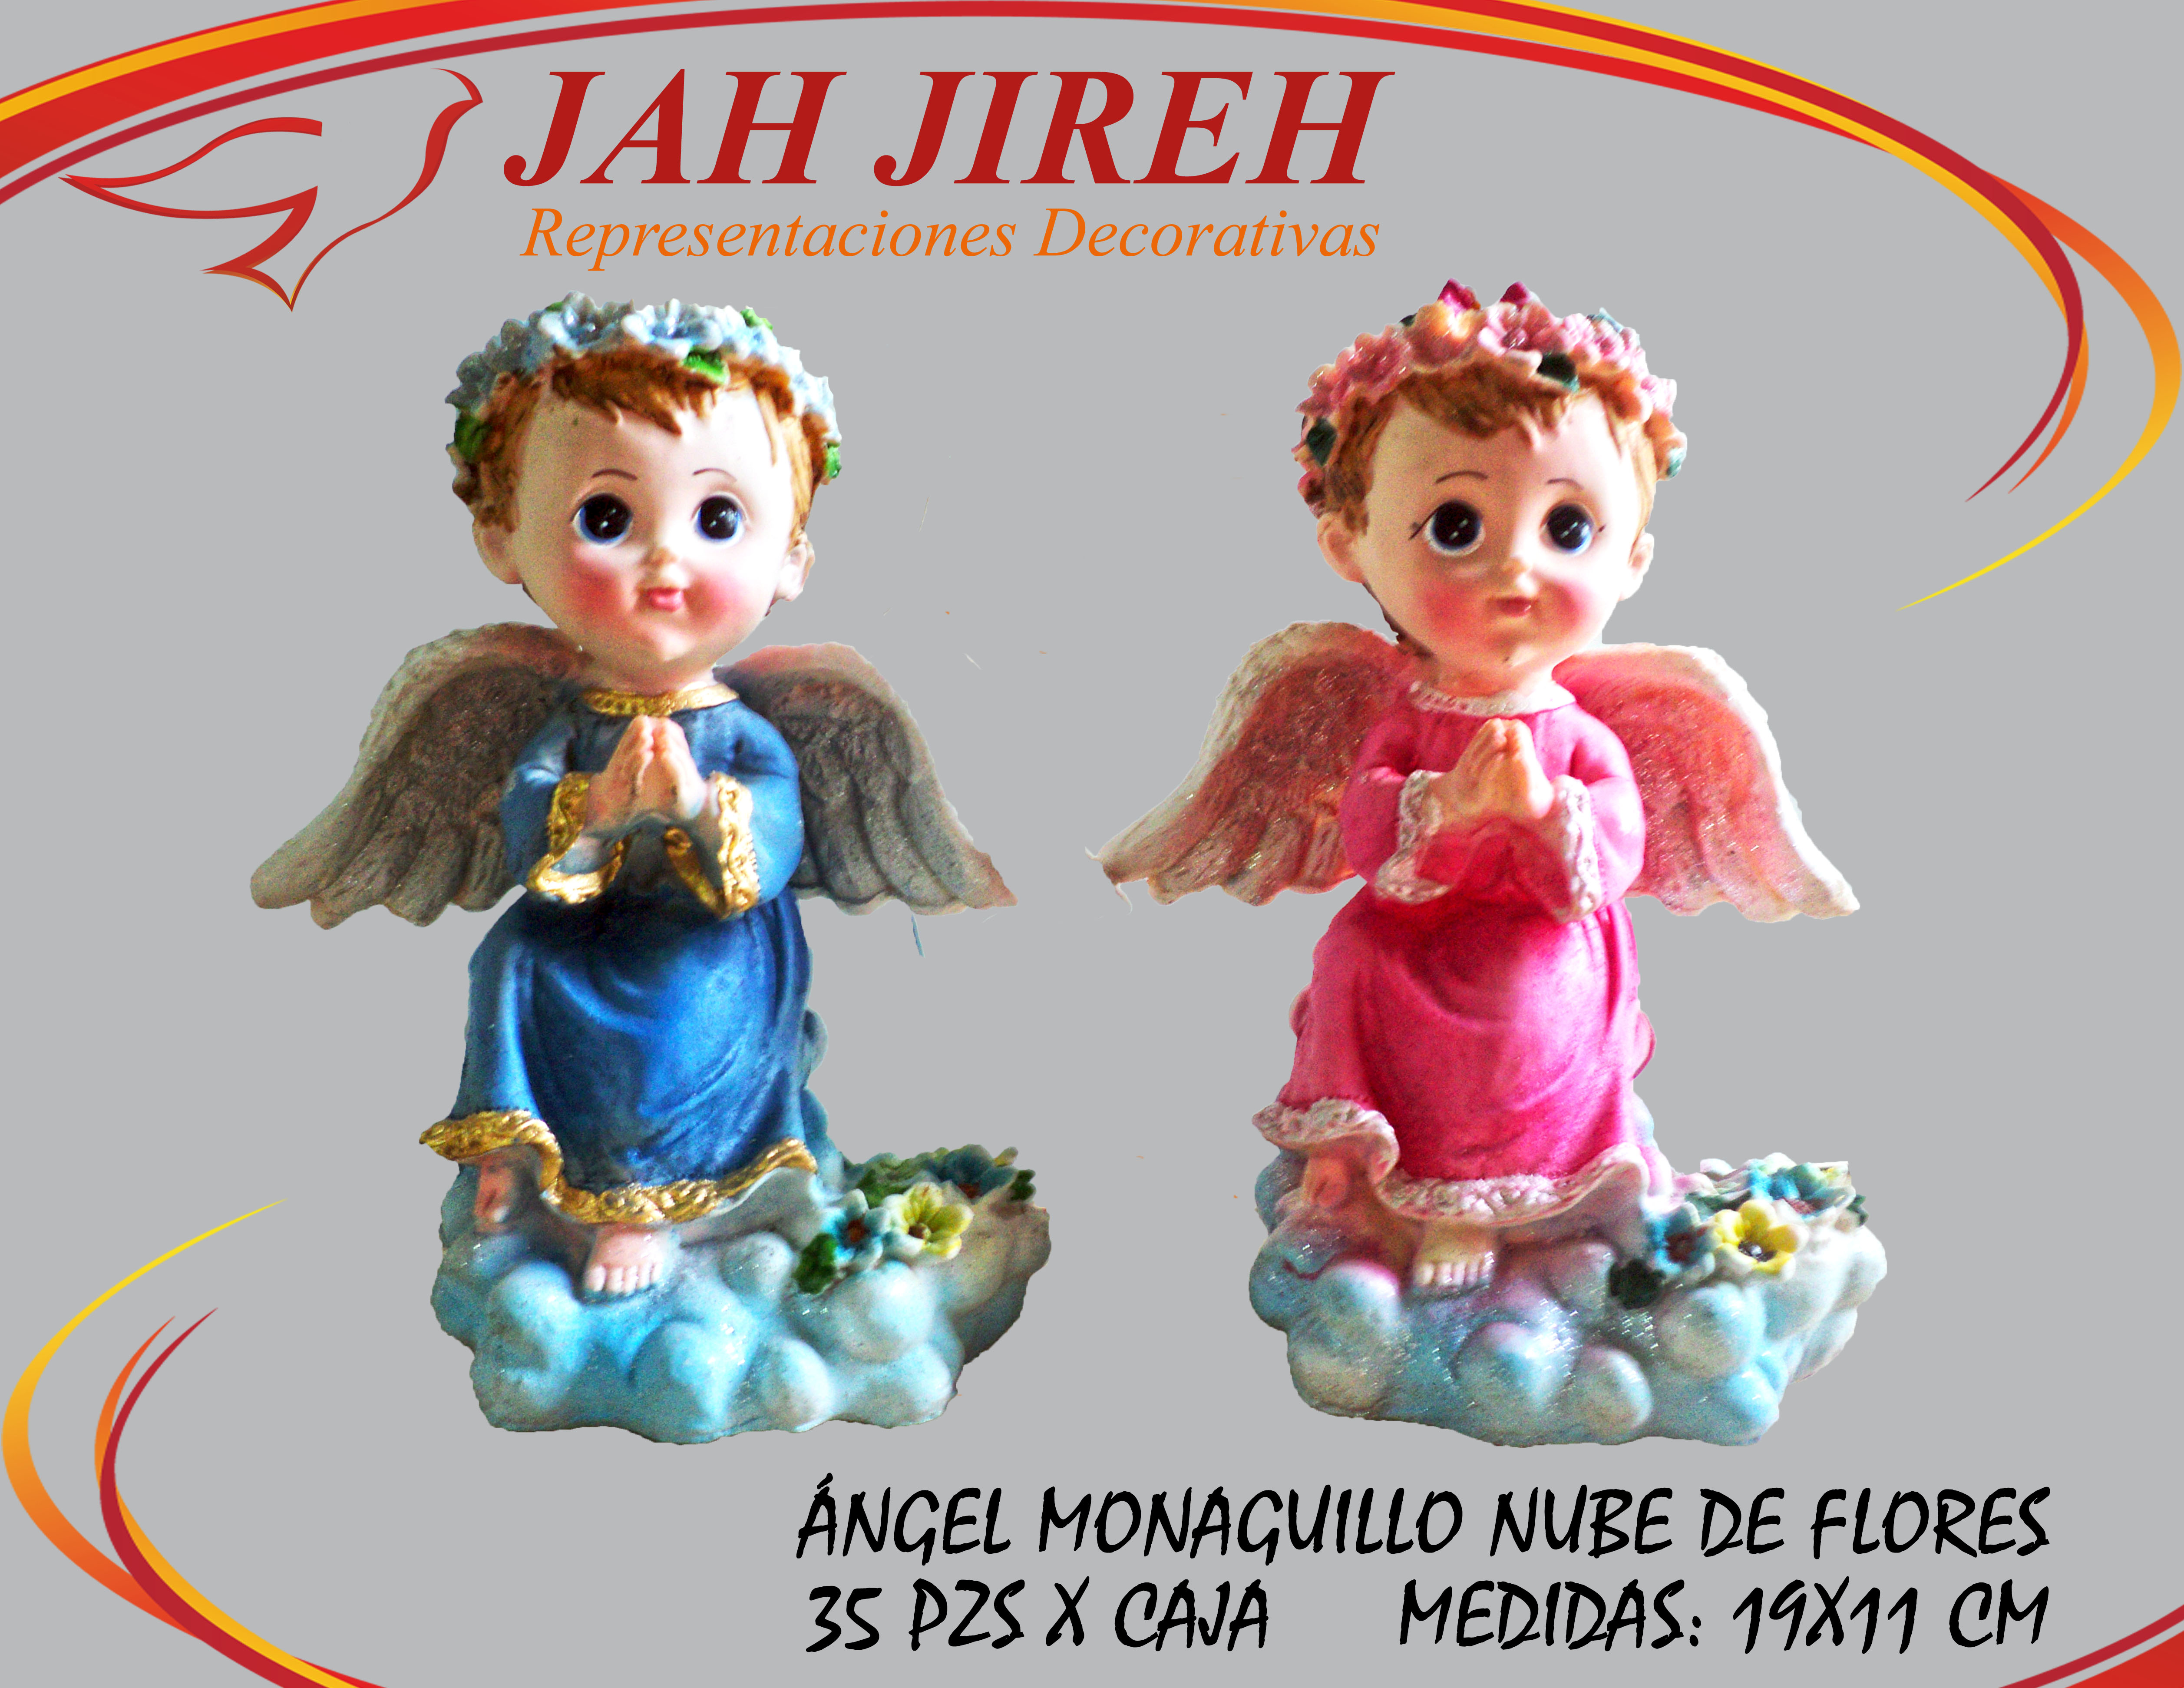 https://0201.nccdn.net/1_2/000/000/10d/b2b/angel-monaguillo-nube-de-flores.jpg